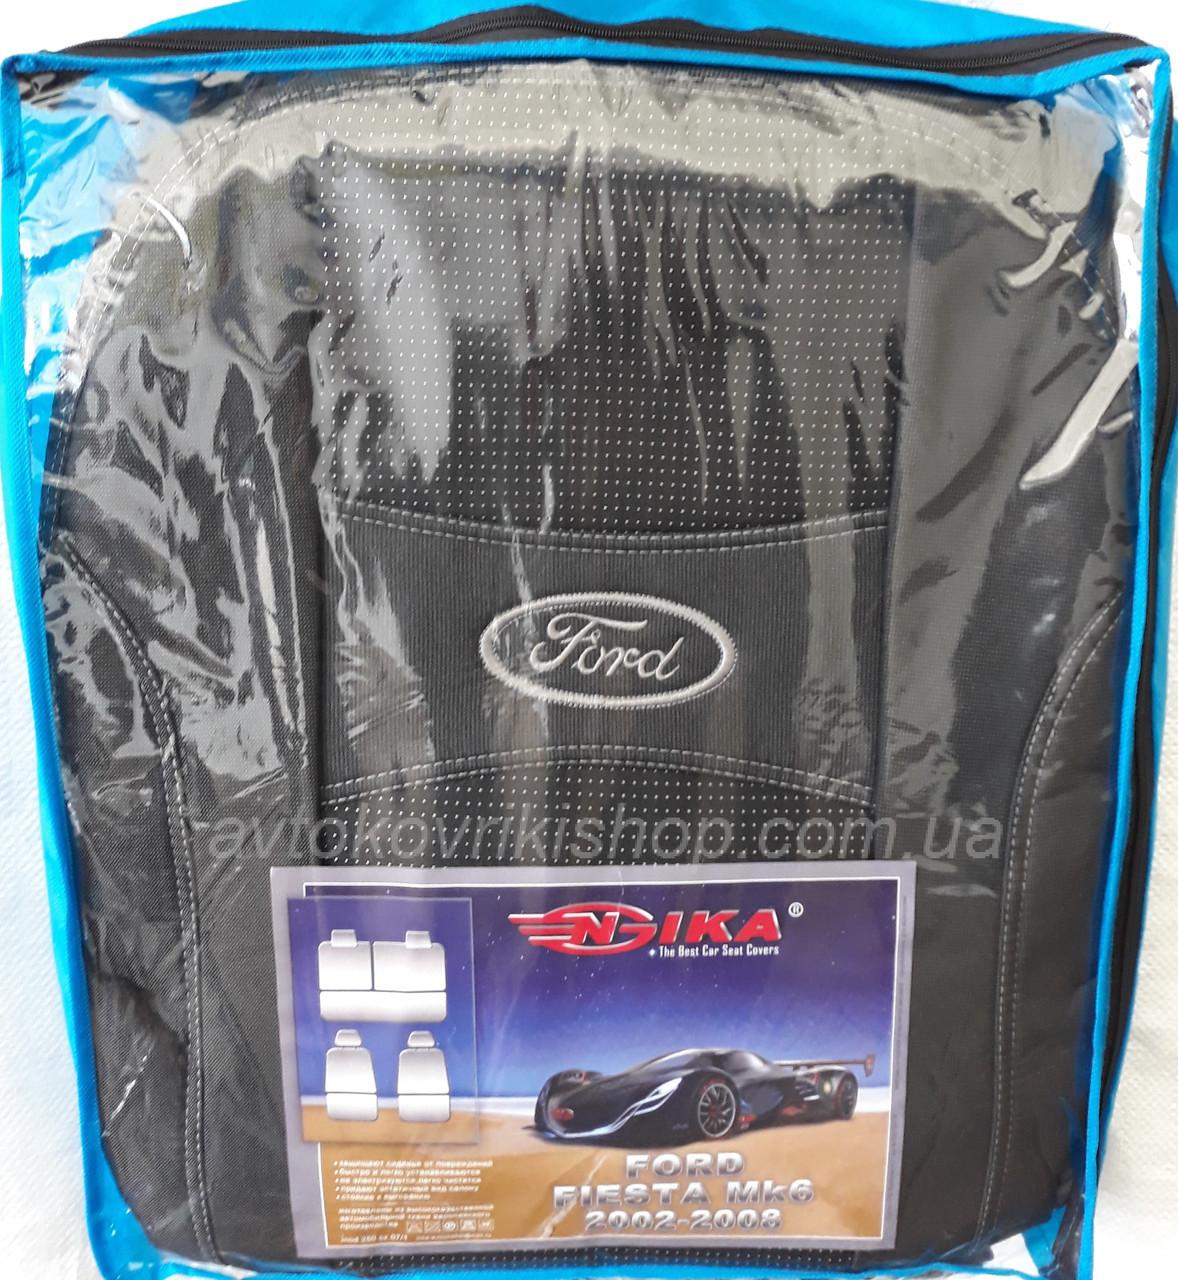 Автомобильные чехлы Ford Fiesta MК 6 2002-2008 Nika